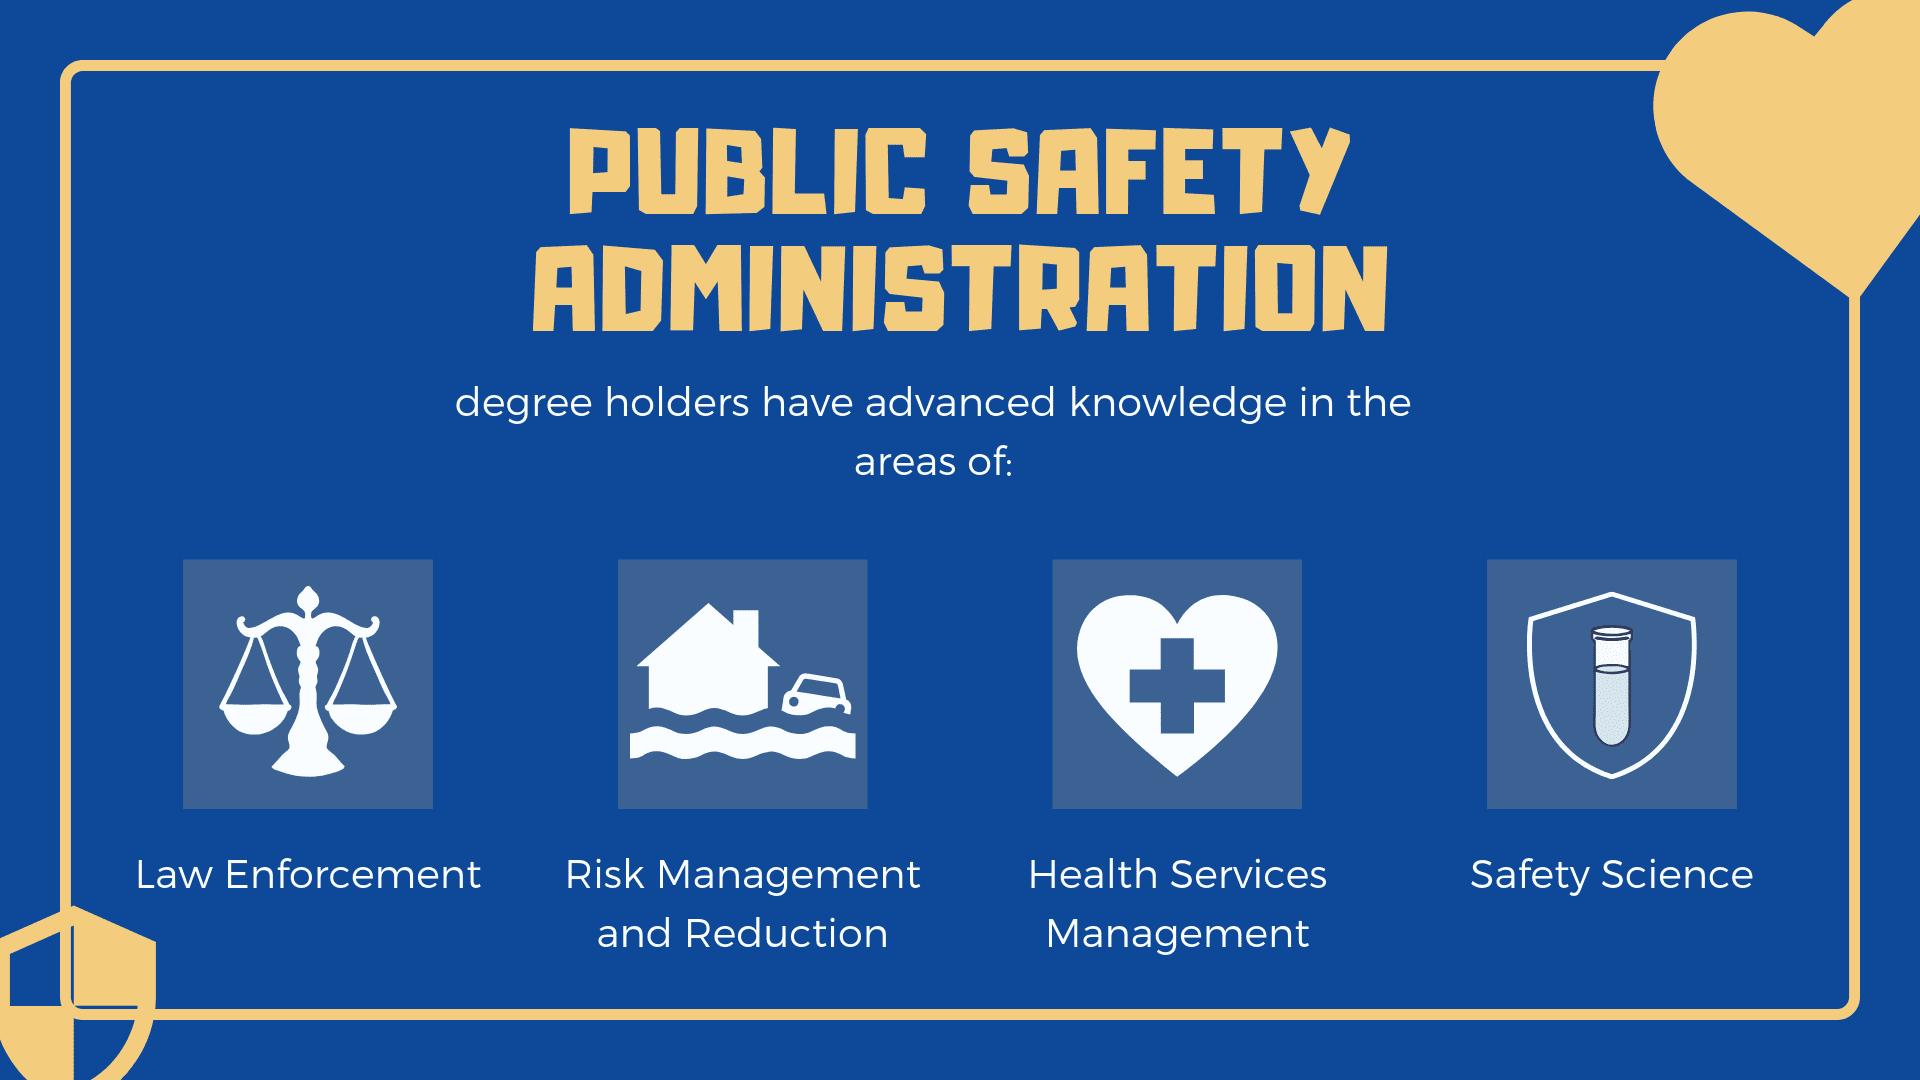 Public Safety Admin training & knowledge